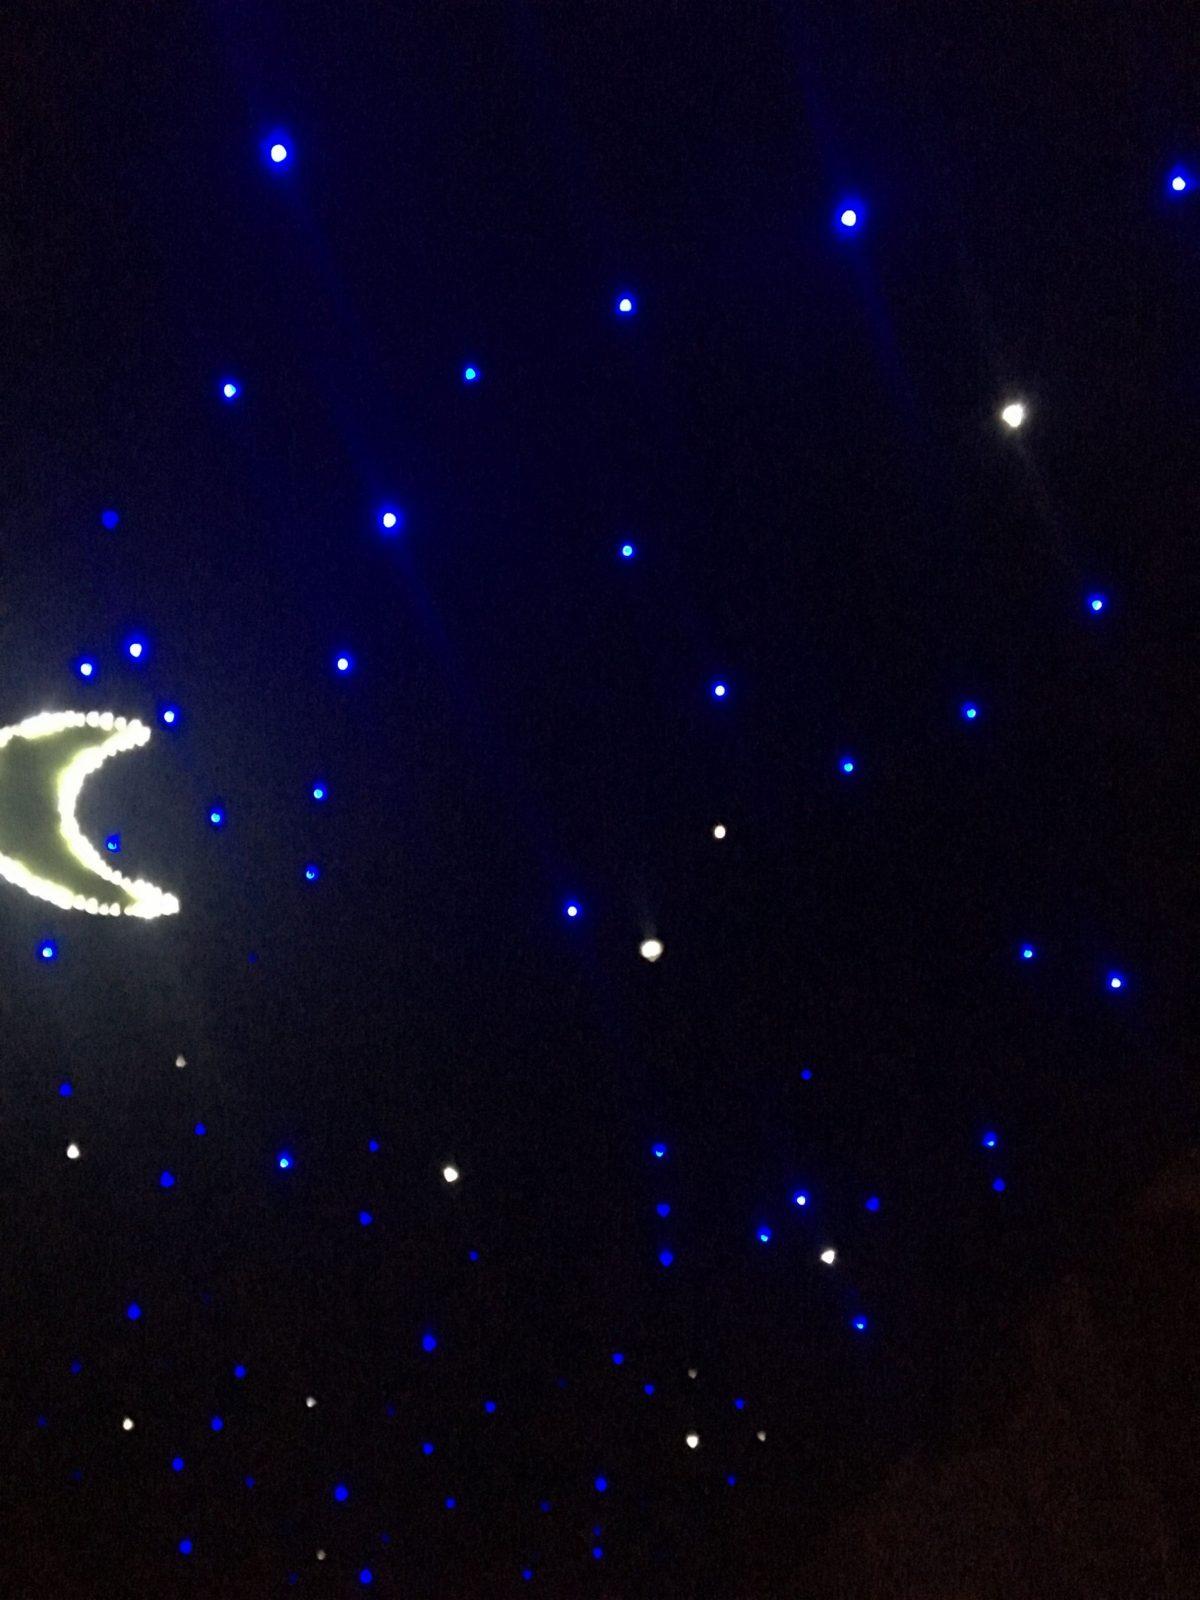 Led Sternenhimmel Bauanleitung Zum Selber Bauen  Heimwerkerforum von Sternenhimmel Led Selber Bauen Bild